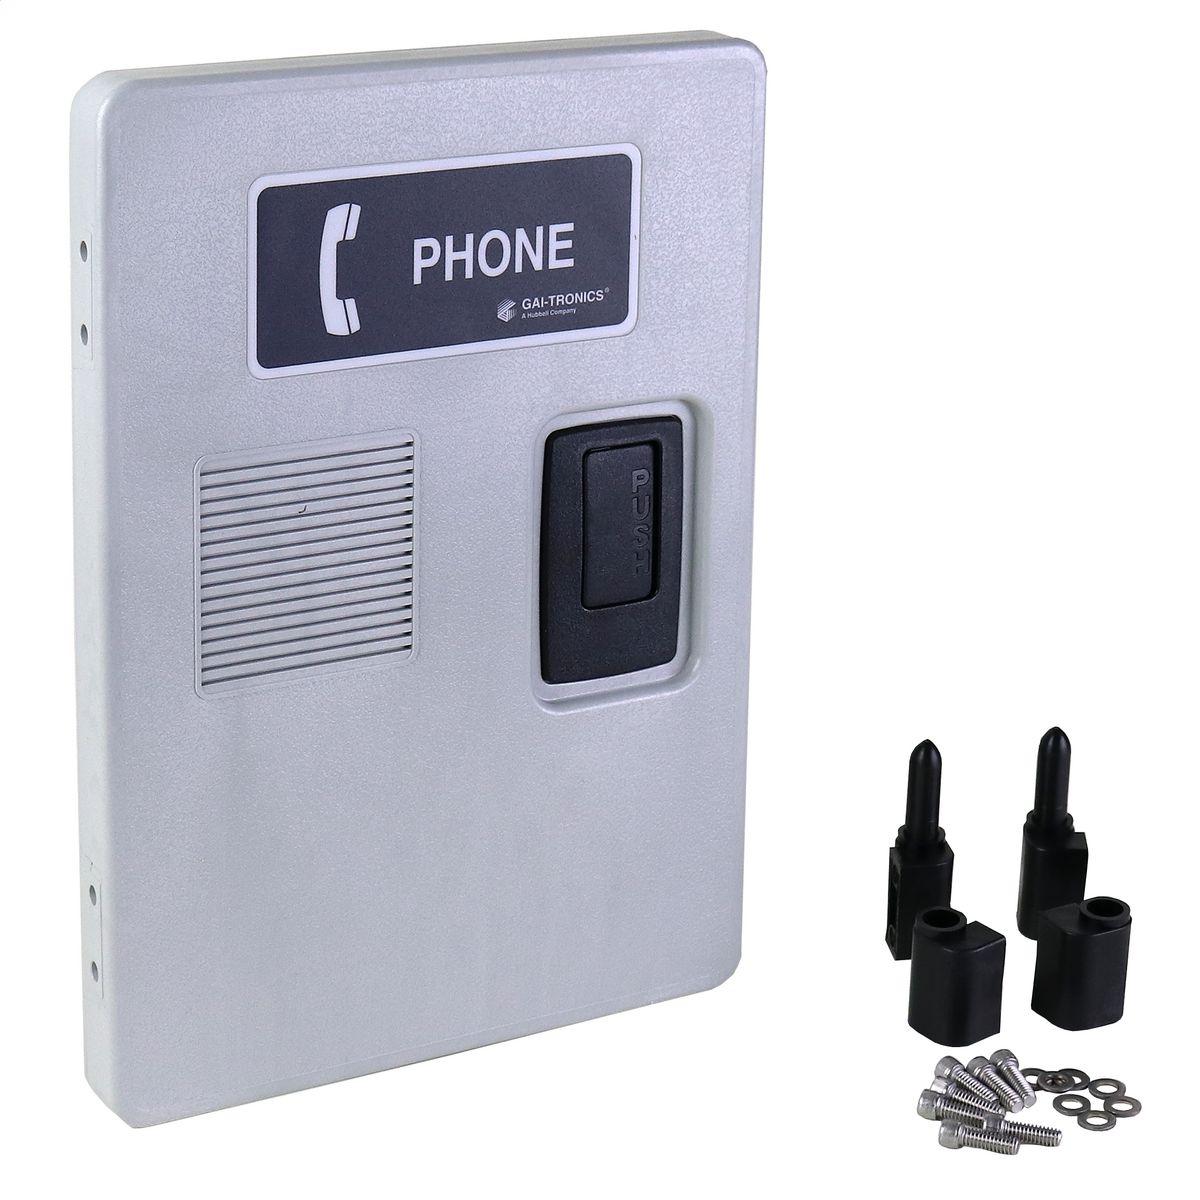 12513-006  sc 1 st  Hubbell & Door Replacement Kit-256/257 Series | Brand | GAI-Tronics